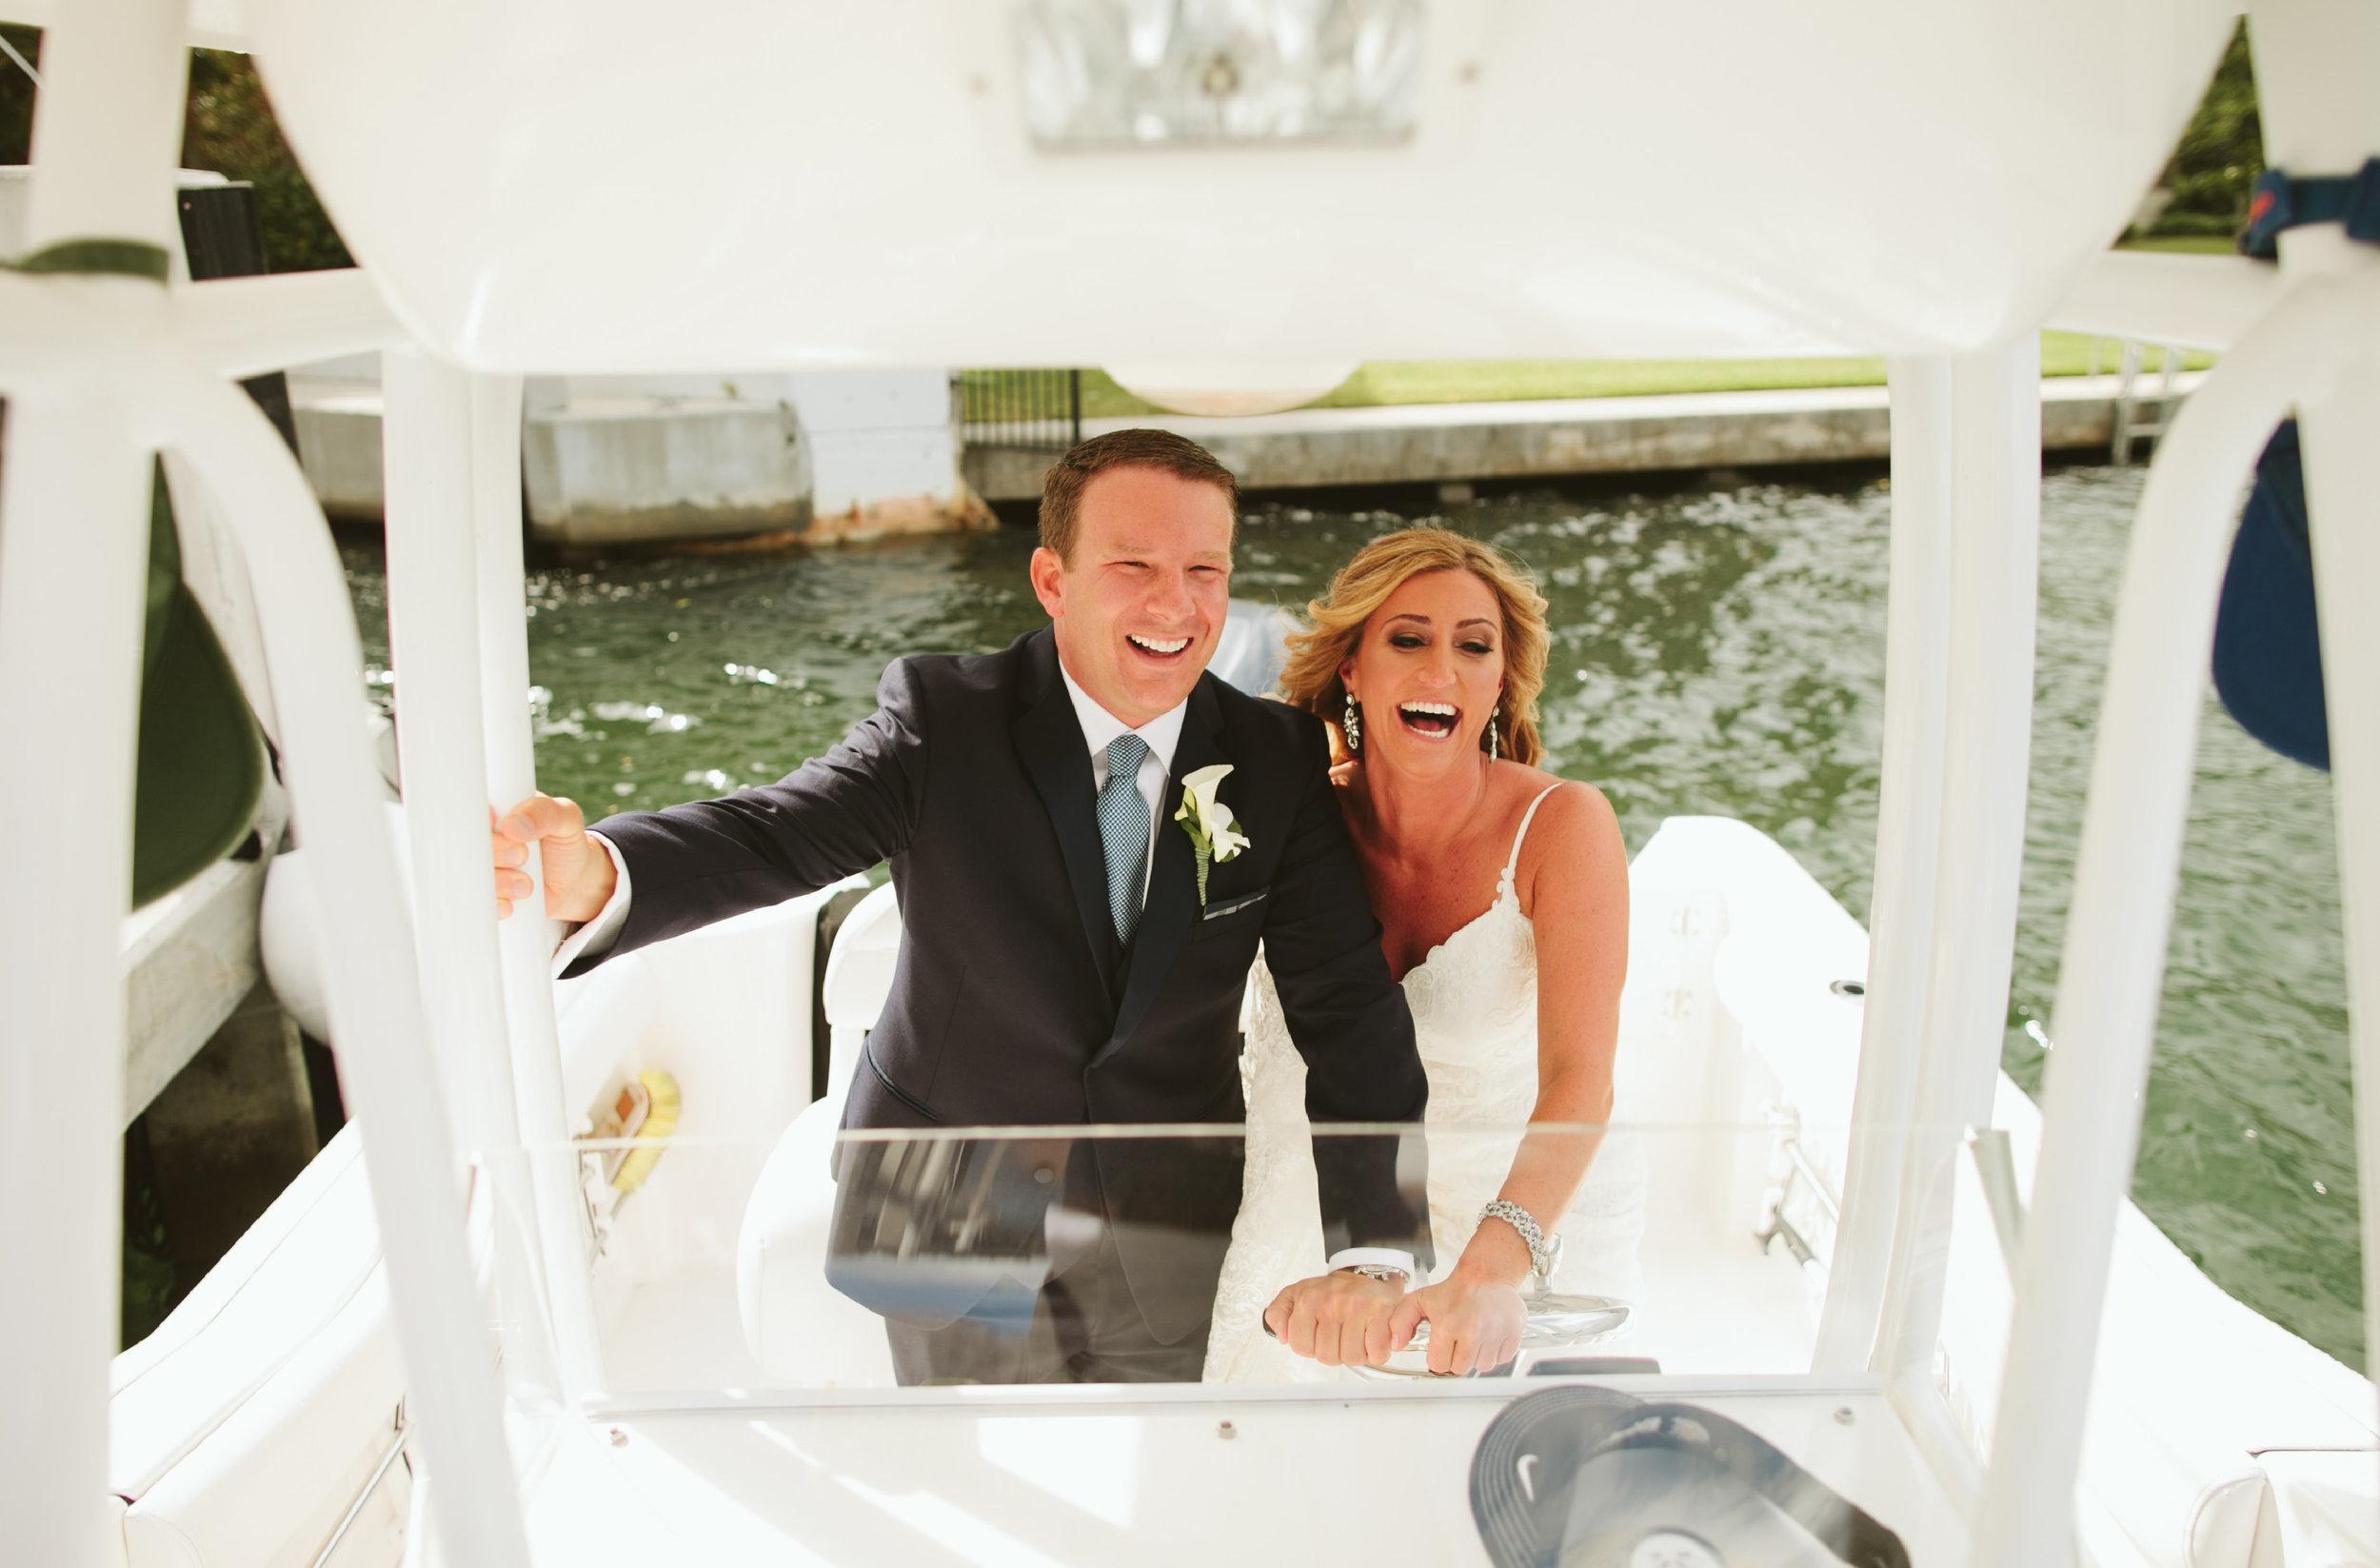 Kim + John's Wedding at the Waterstone Hotel in Boca Raton26.jpg